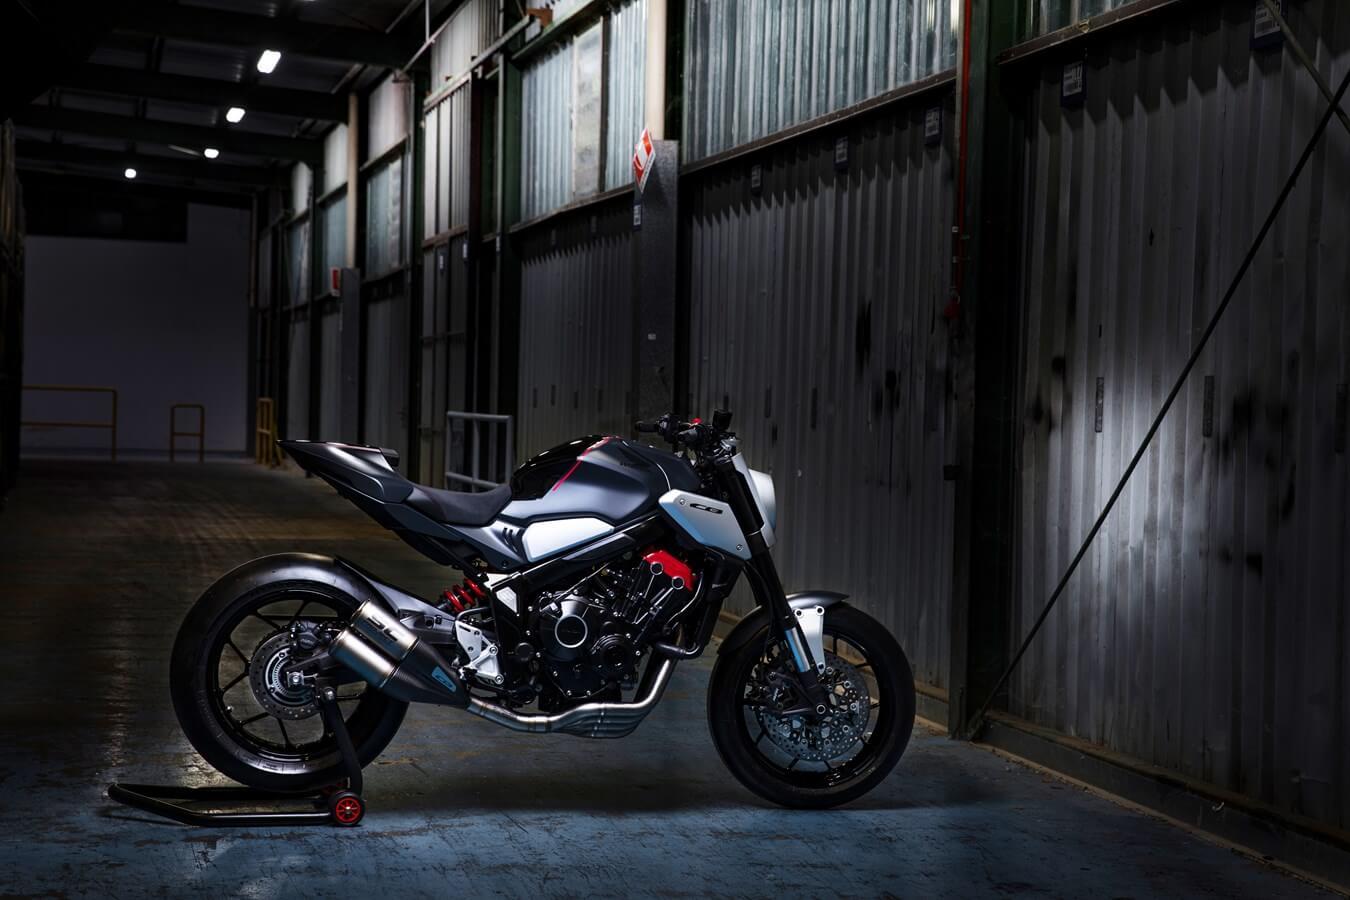 2019 Honda CB650R Neo Sports Cafe Concept Motorcycle | New Naked CBR Sport Bike (CB125R / CB300R / CB1000R)